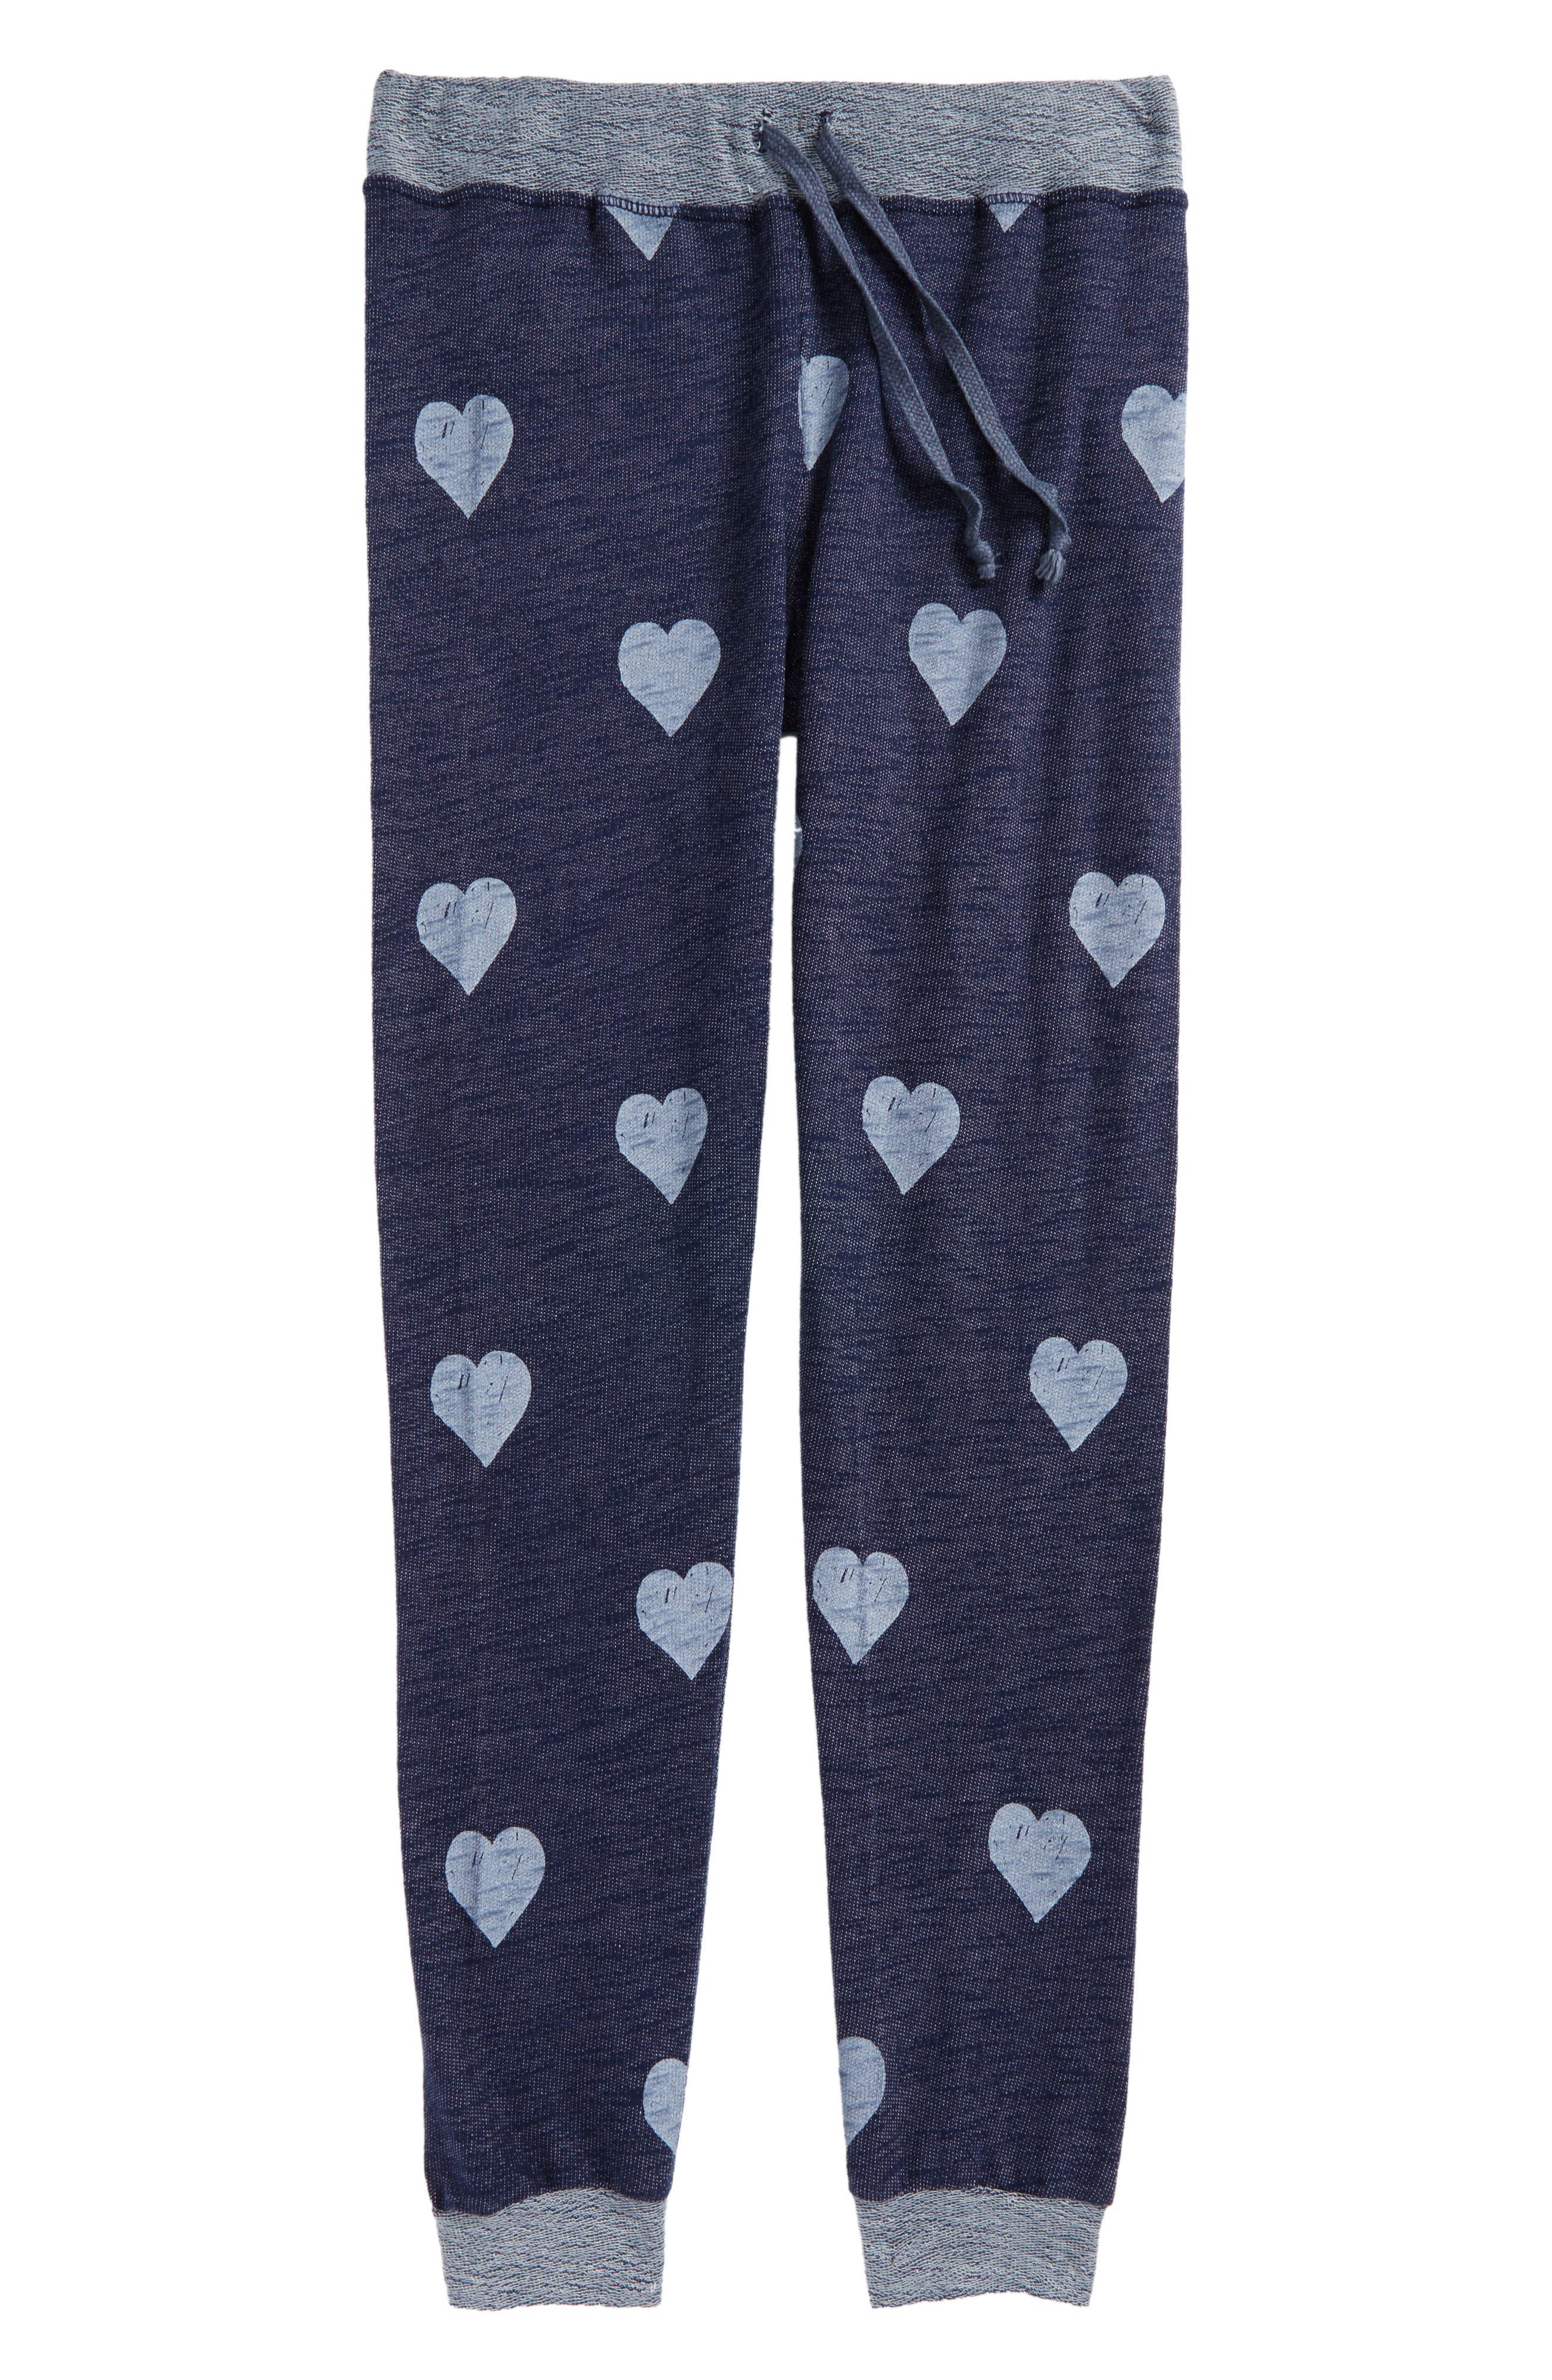 Main Image - T2 Love Heart Print Sweatpants (Big Girls)